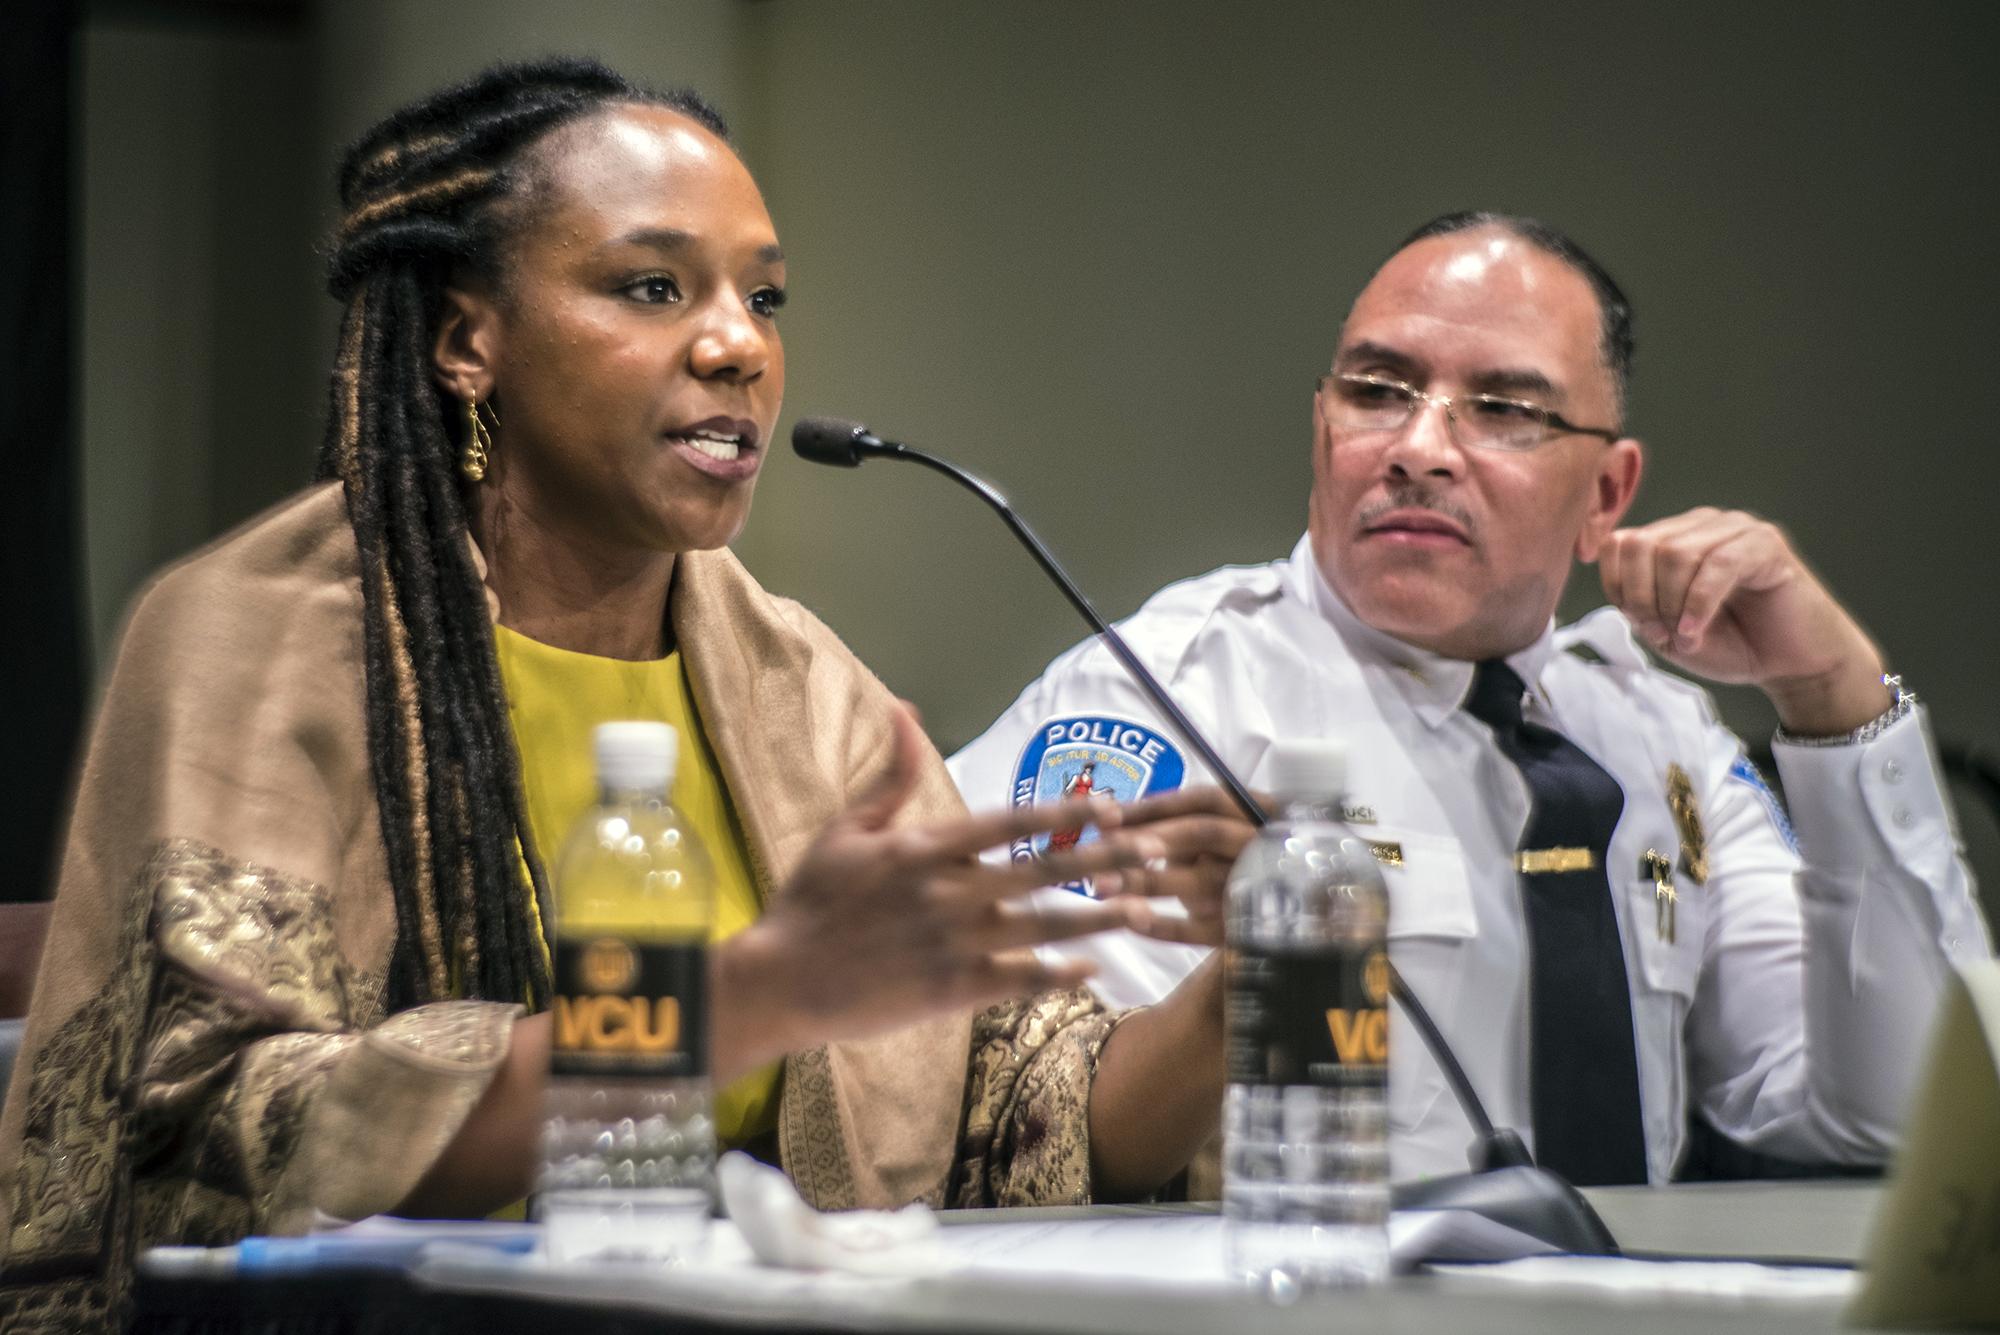 Activist Bree Newsome speaks at the Black Lives Matter Symposium Photo by Craig Zirpolo/RVA Magazine